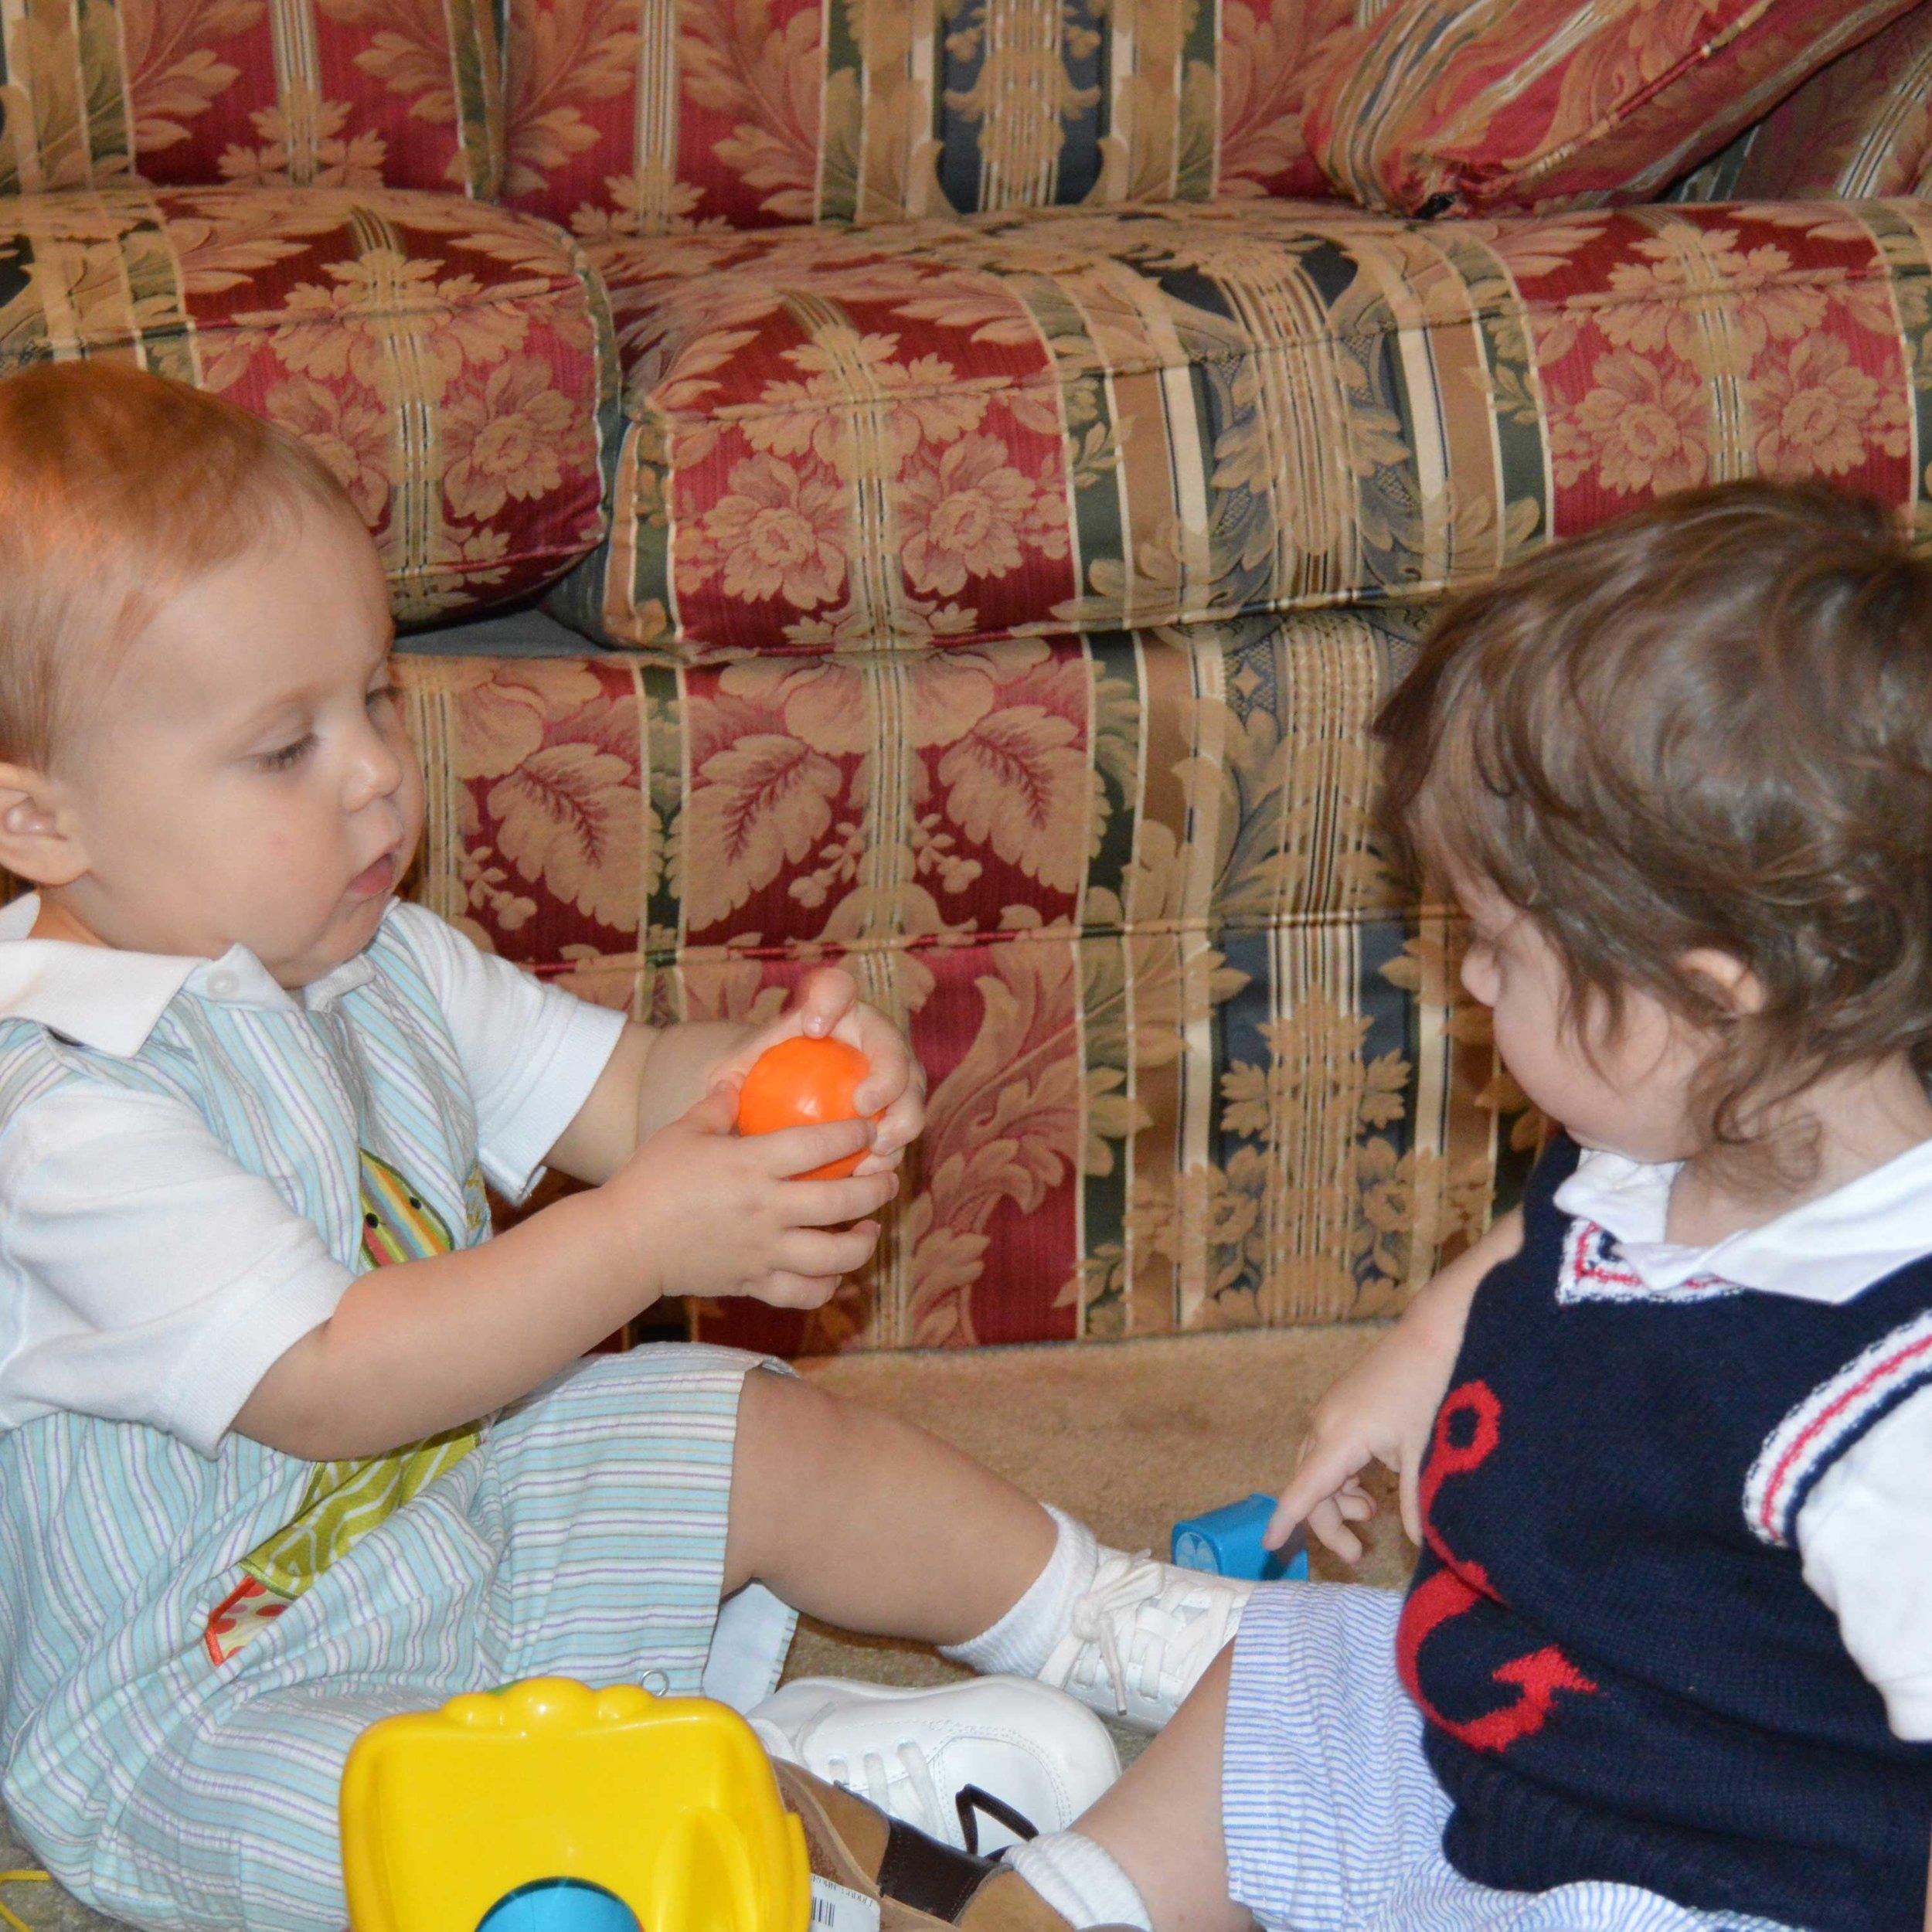 Benjamin and his cousin playing